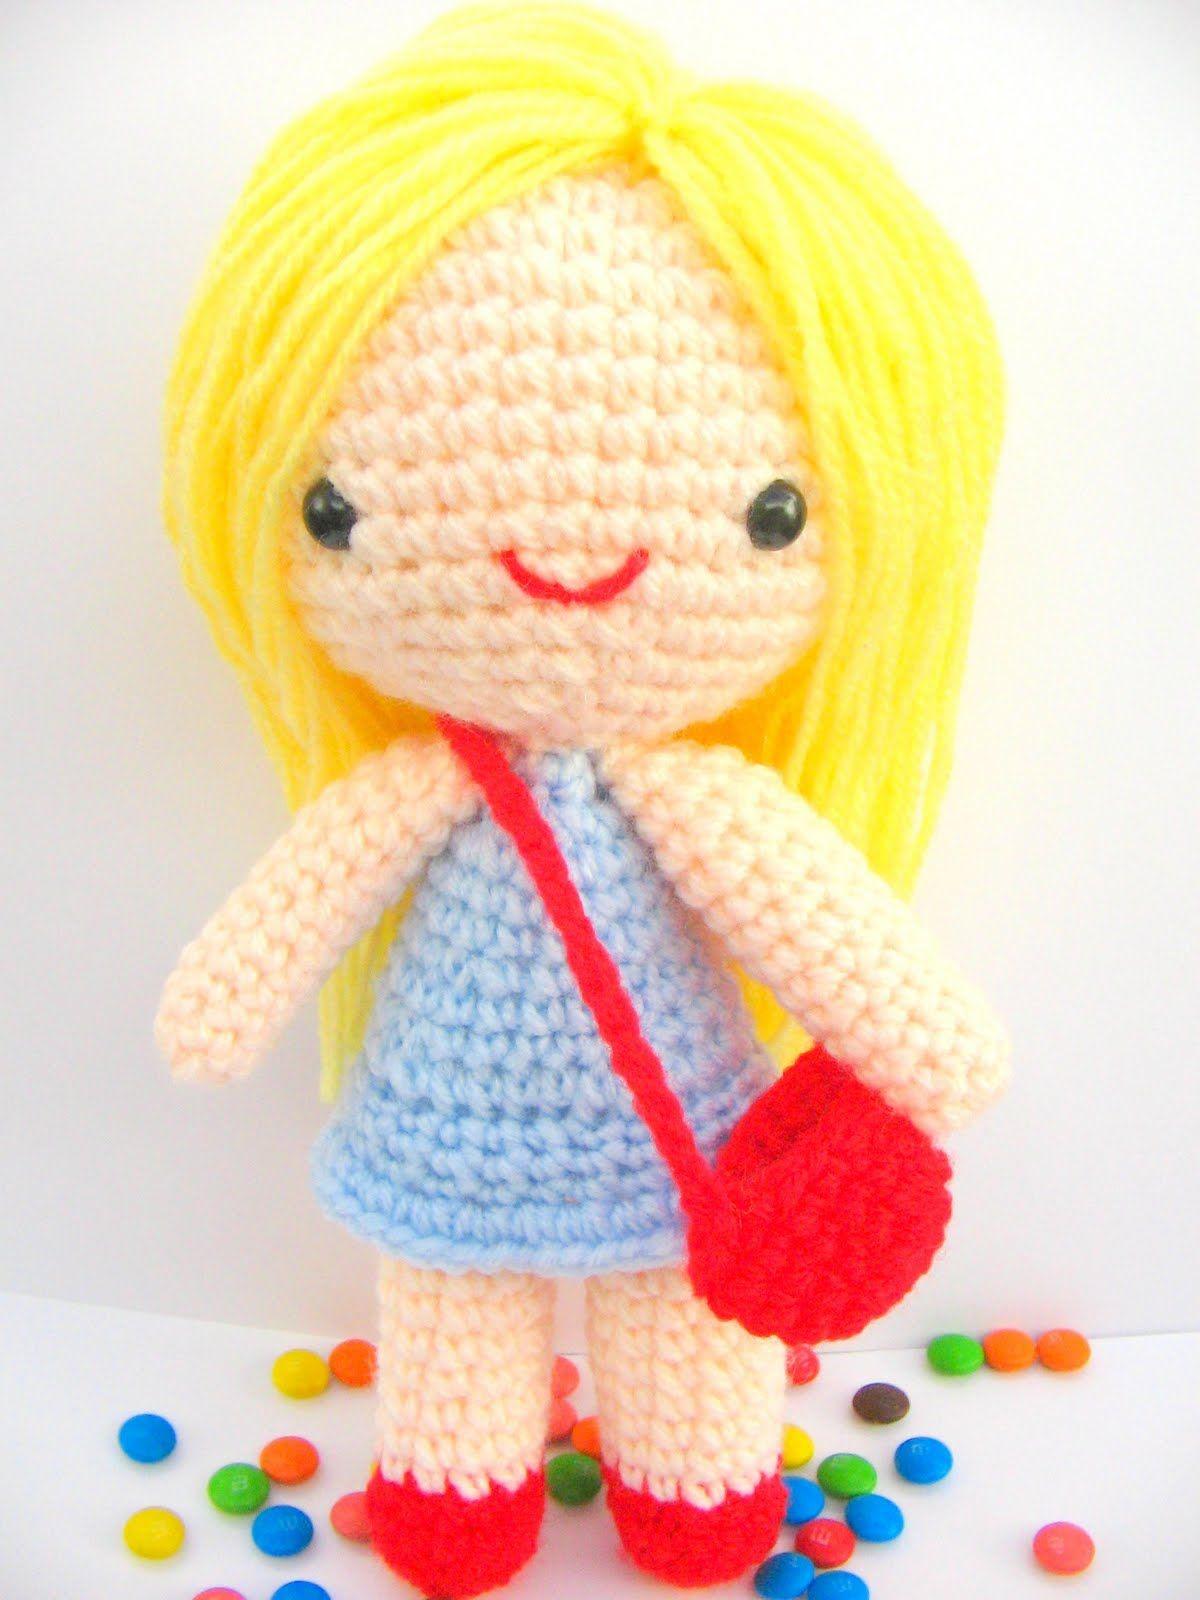 Free Printable Crochet Doll Patterns | 2000 Free Amigurumi Patterns